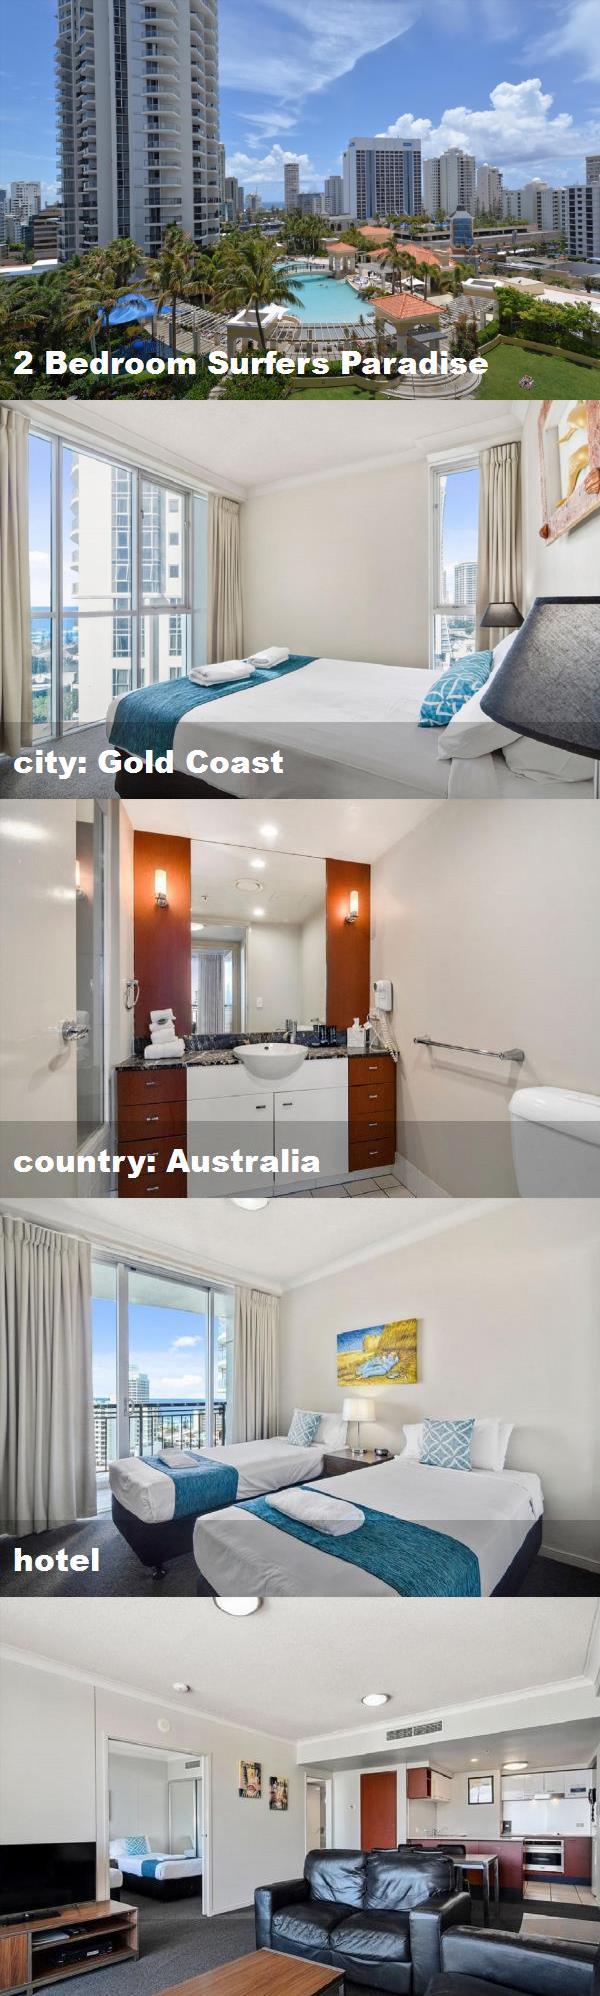 2 Bedroom Surfers Paradise City Gold Coast Country Australia Hotel Surfers Paradise Australia Hotels Gold Coast